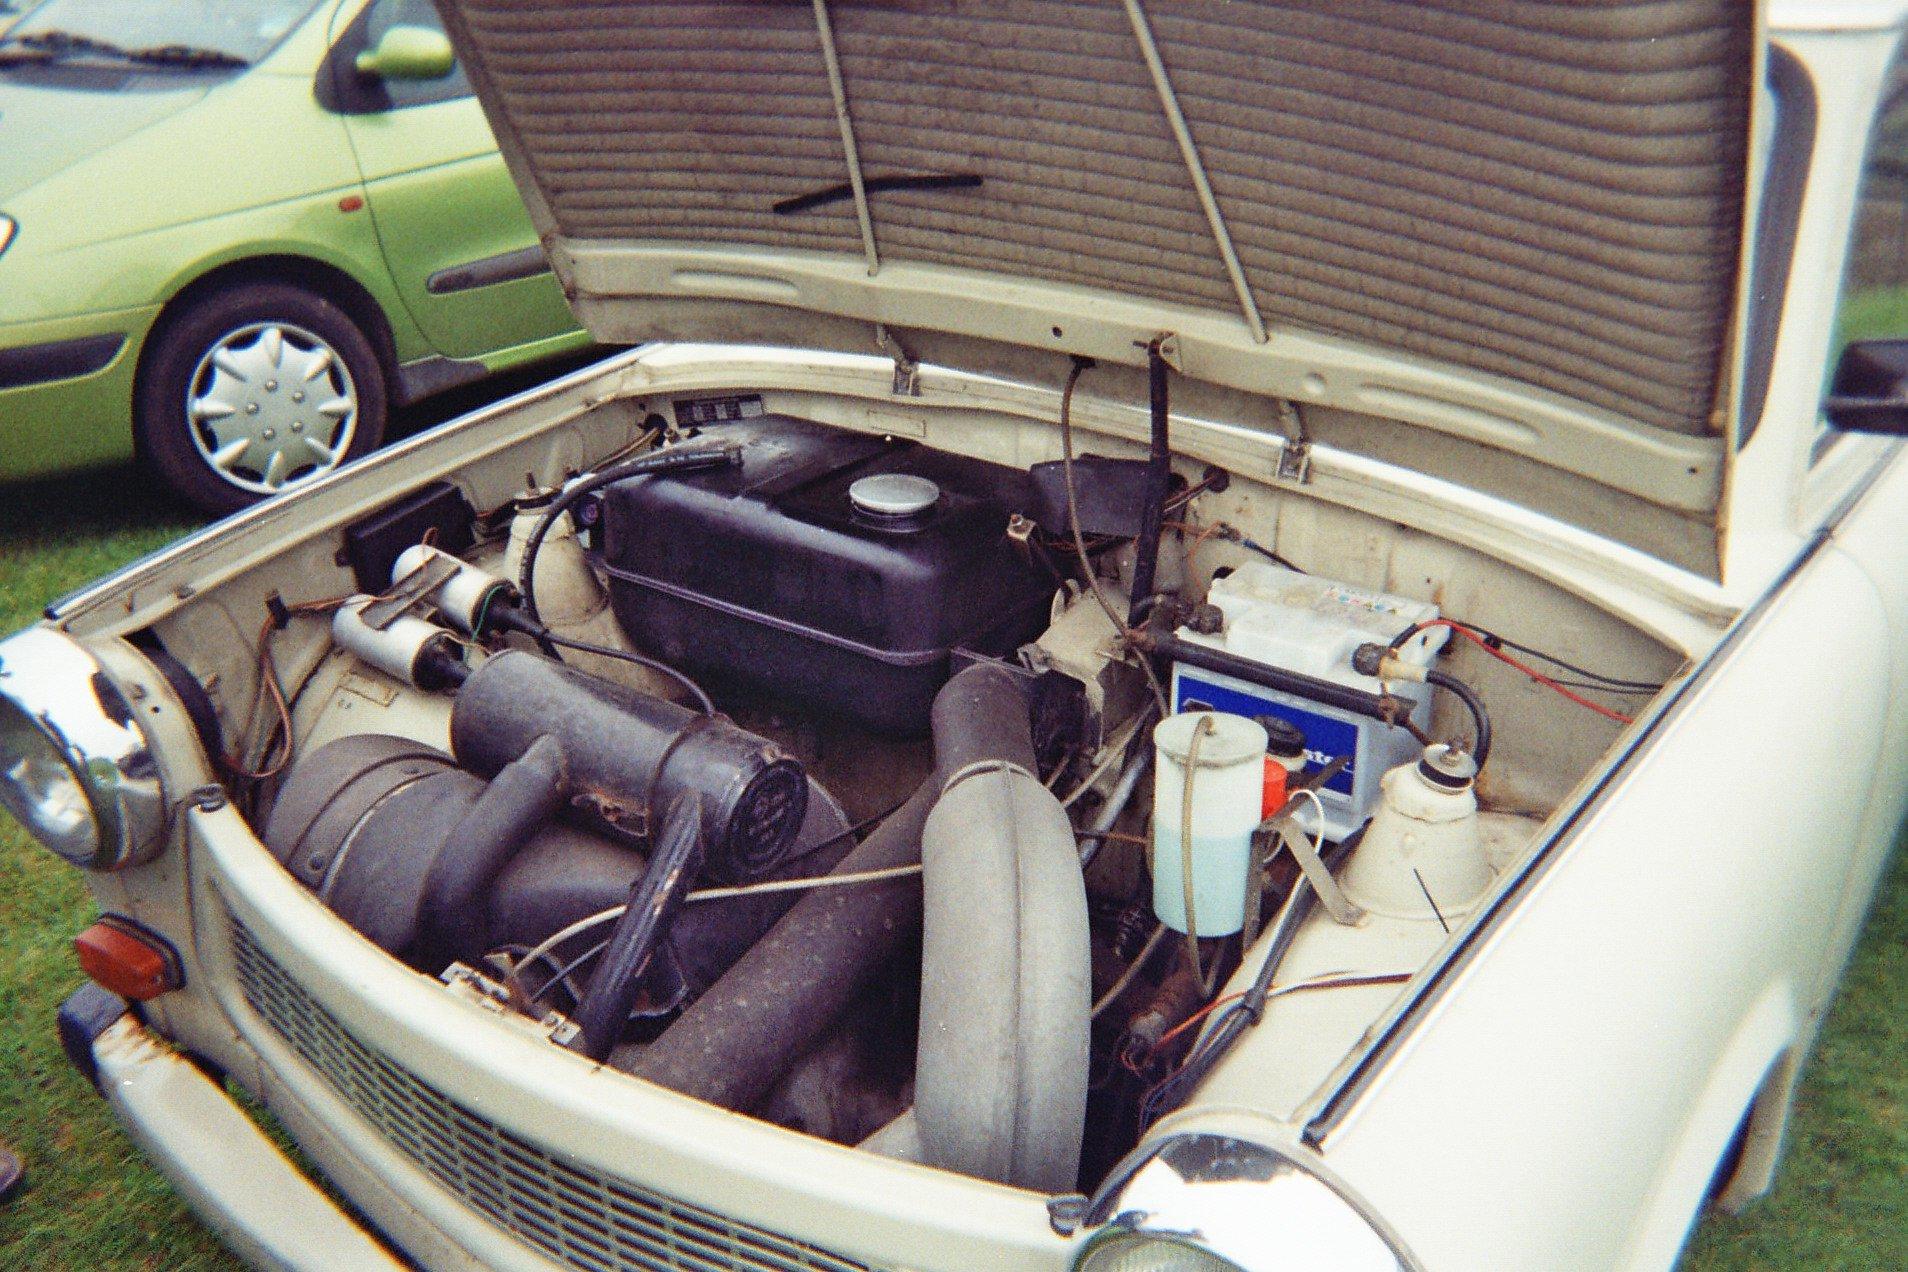 RT @HistoryNed: The Trabant had…